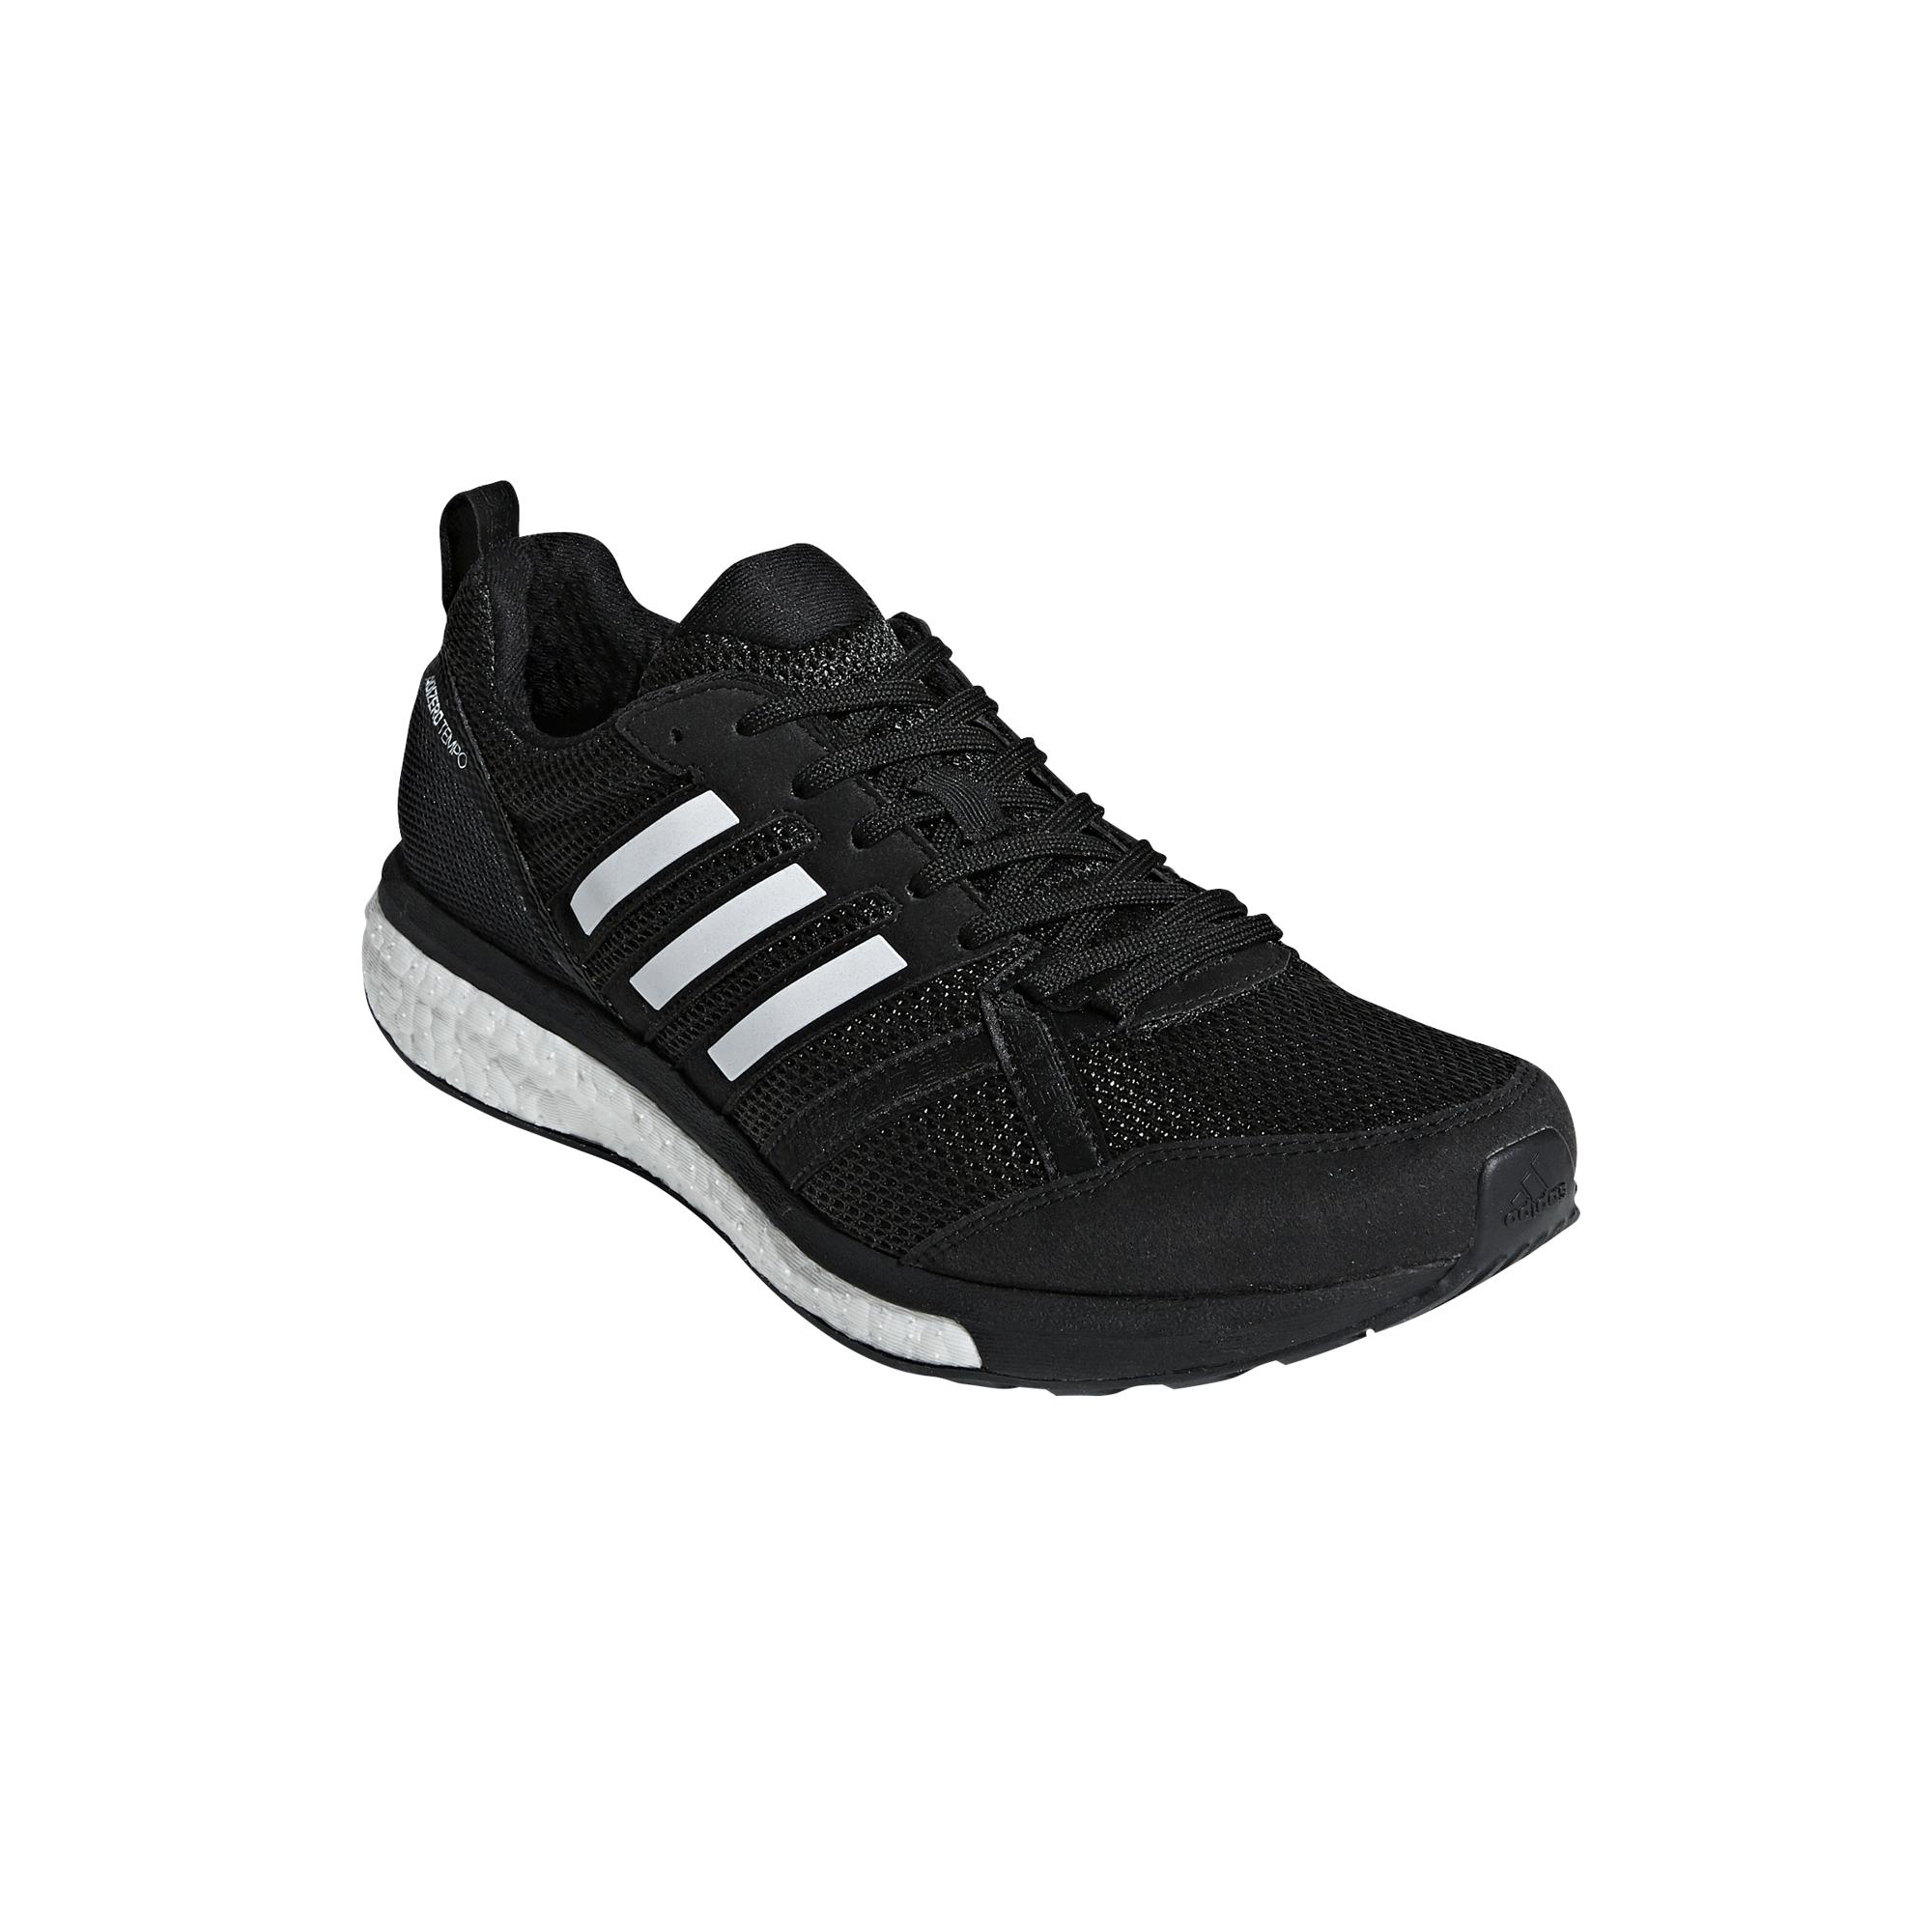 sports shoes 3f936 72e85 Chaussures adidas s adizero Tempo 9